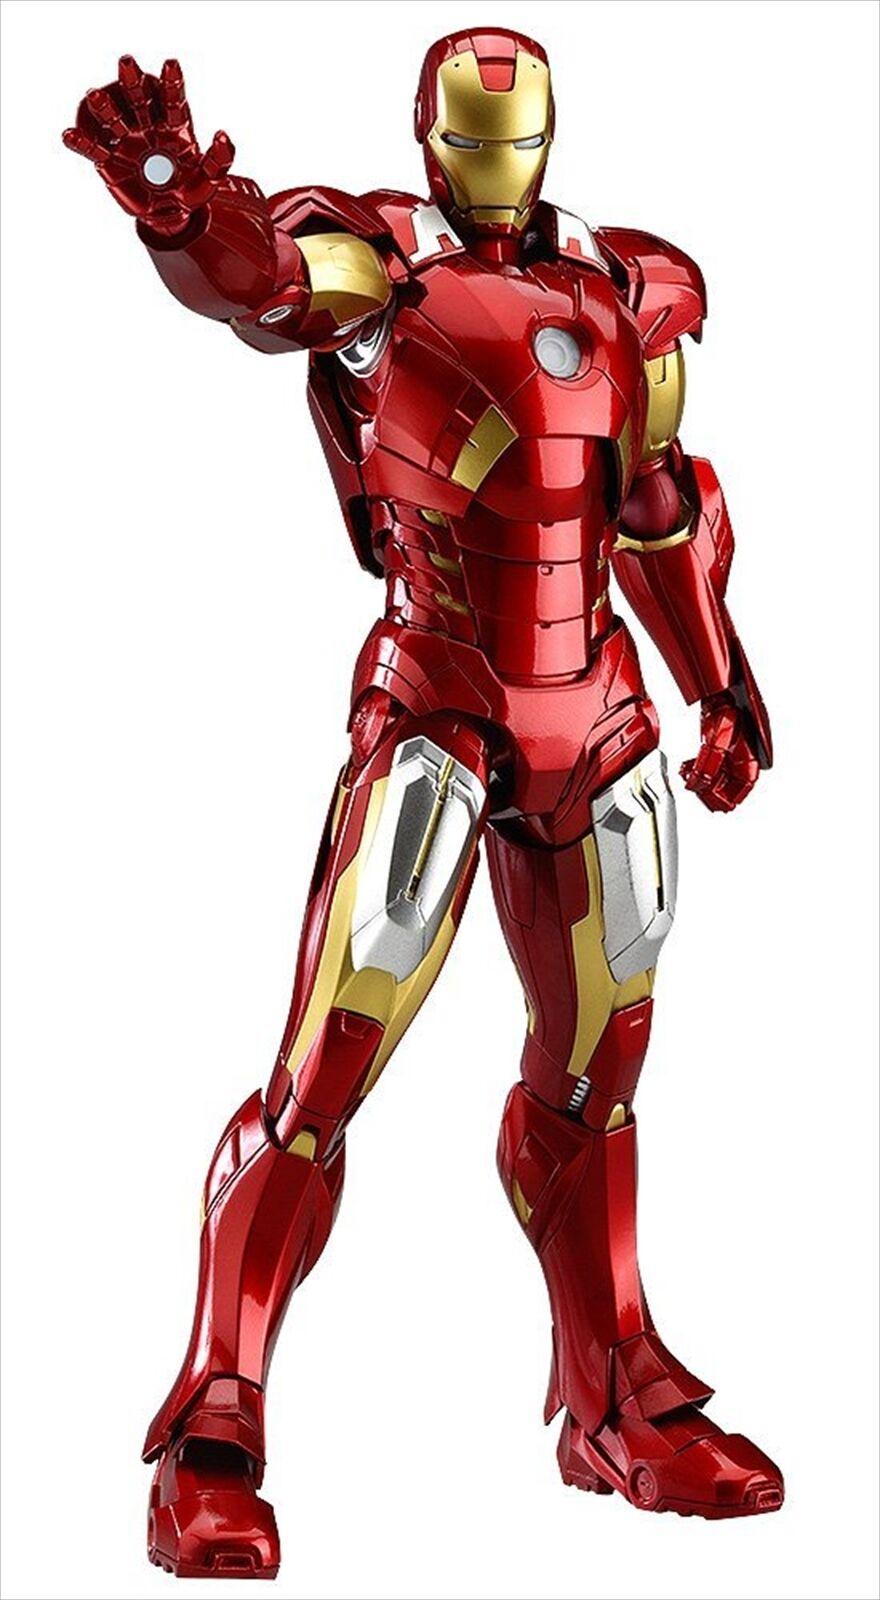 Good Smile Company figma The Avengers Iron Man Mark VII 7 Action Figure